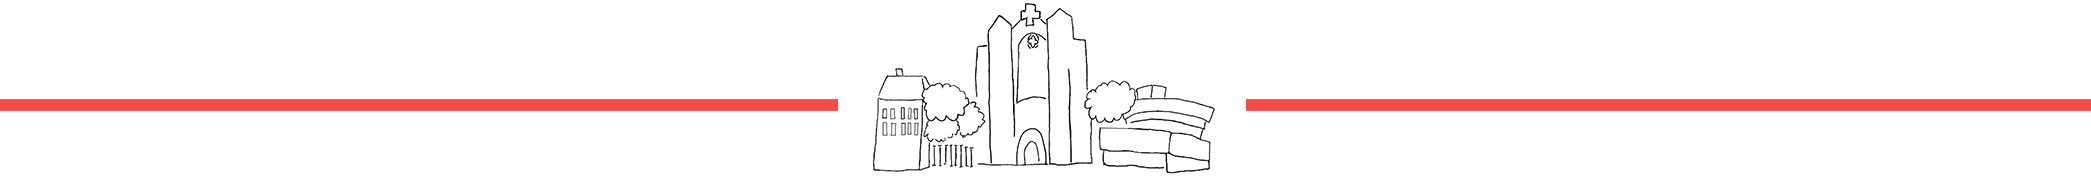 church-skyline-red-divider.jpg